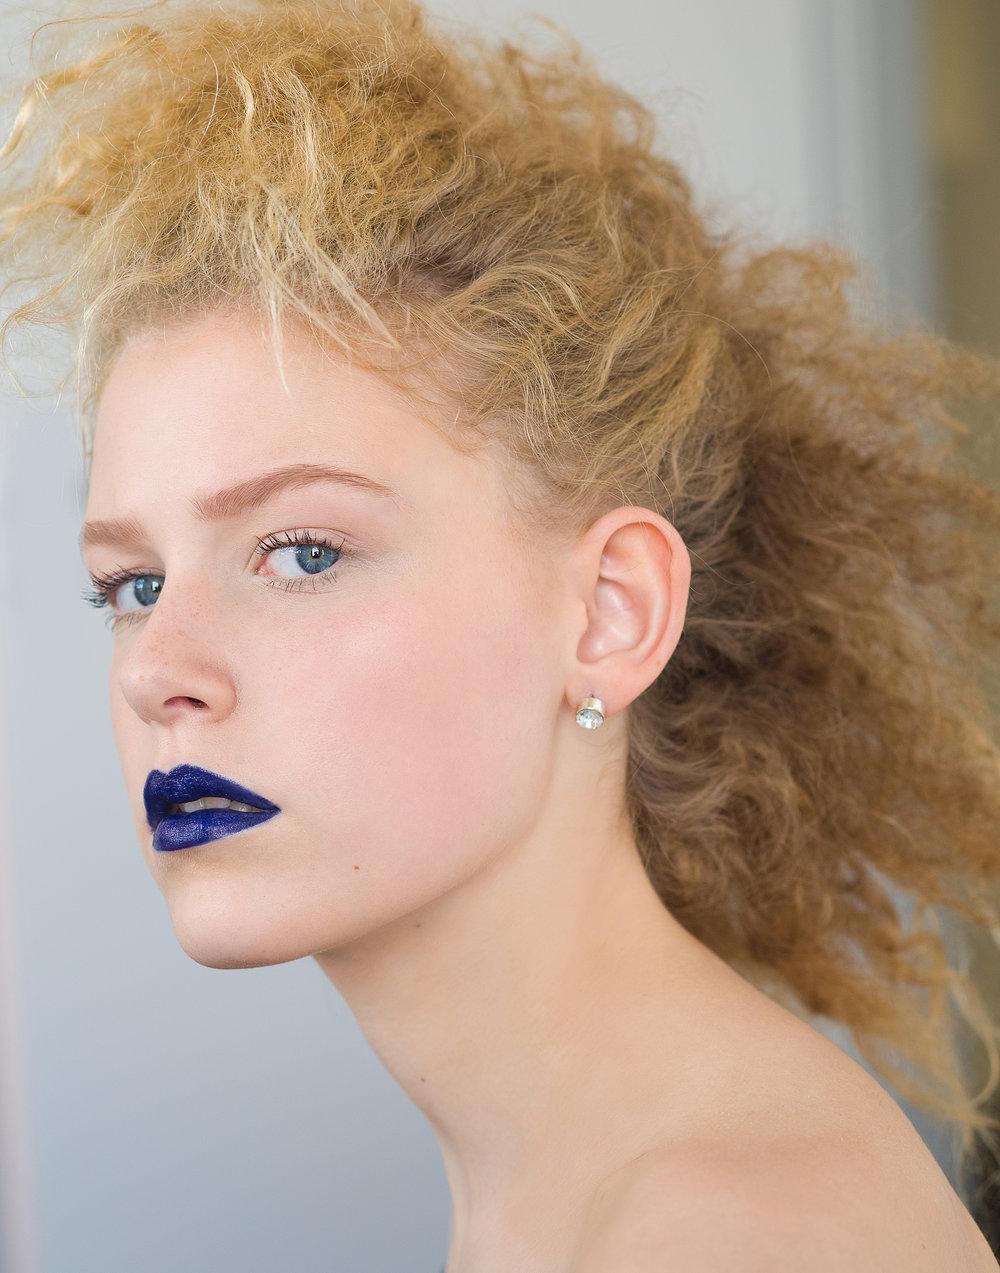 model Saga photographer  Justin W. King